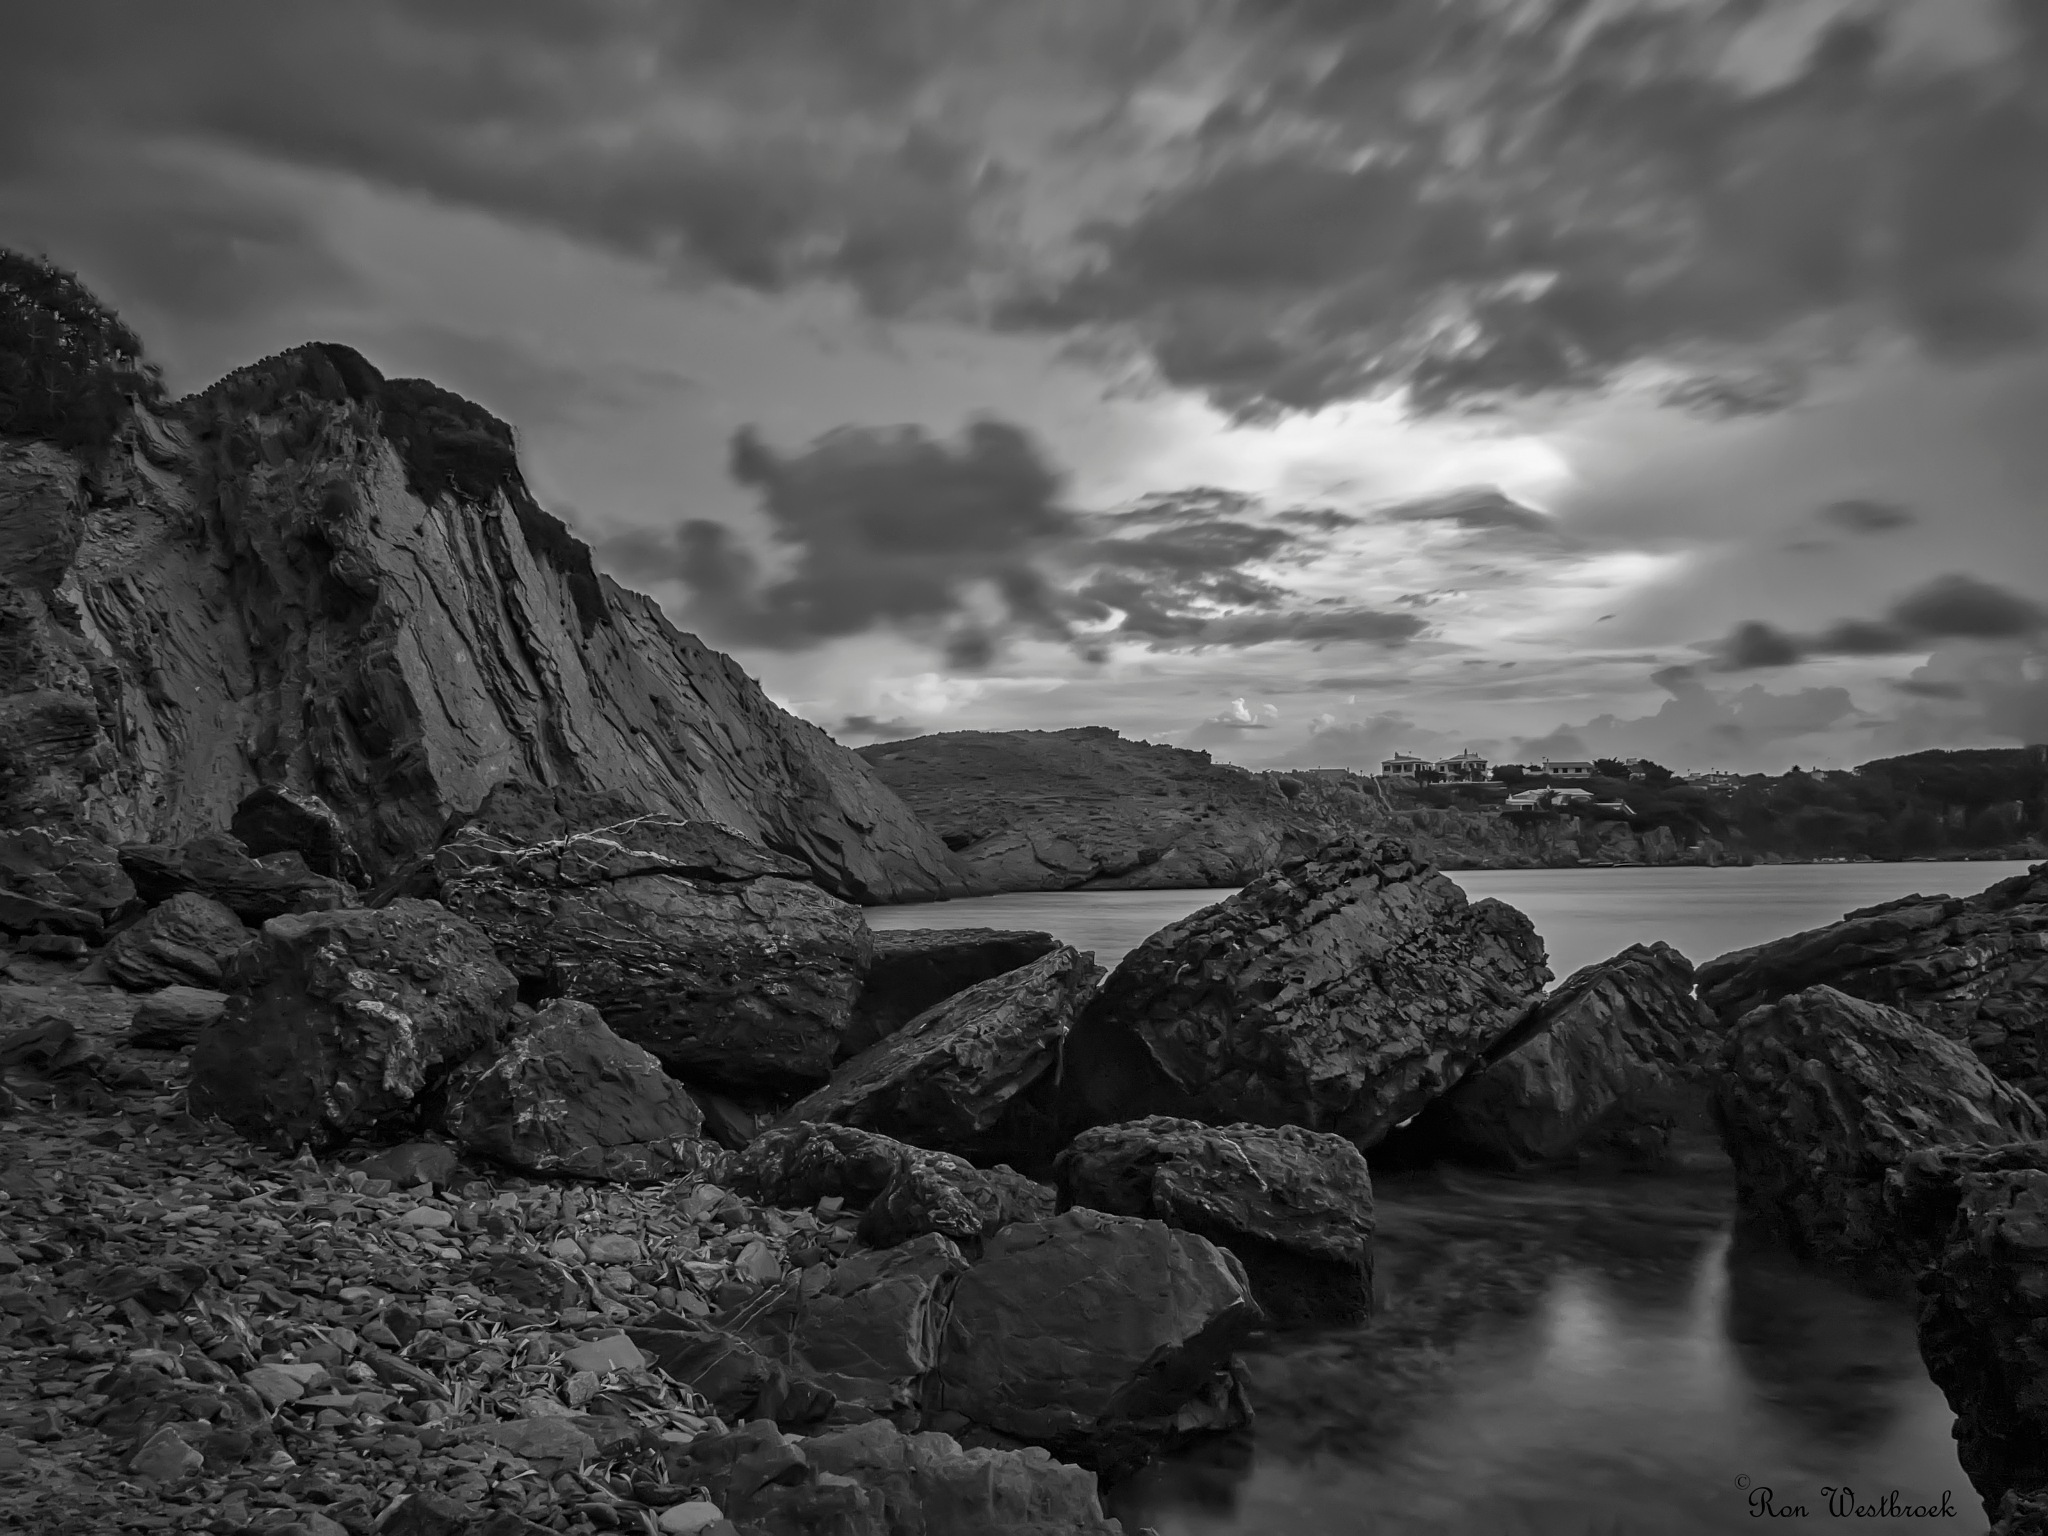 Rocks from the beach of Arenal d'en Castell, Menorca.  by Ron Westbroek